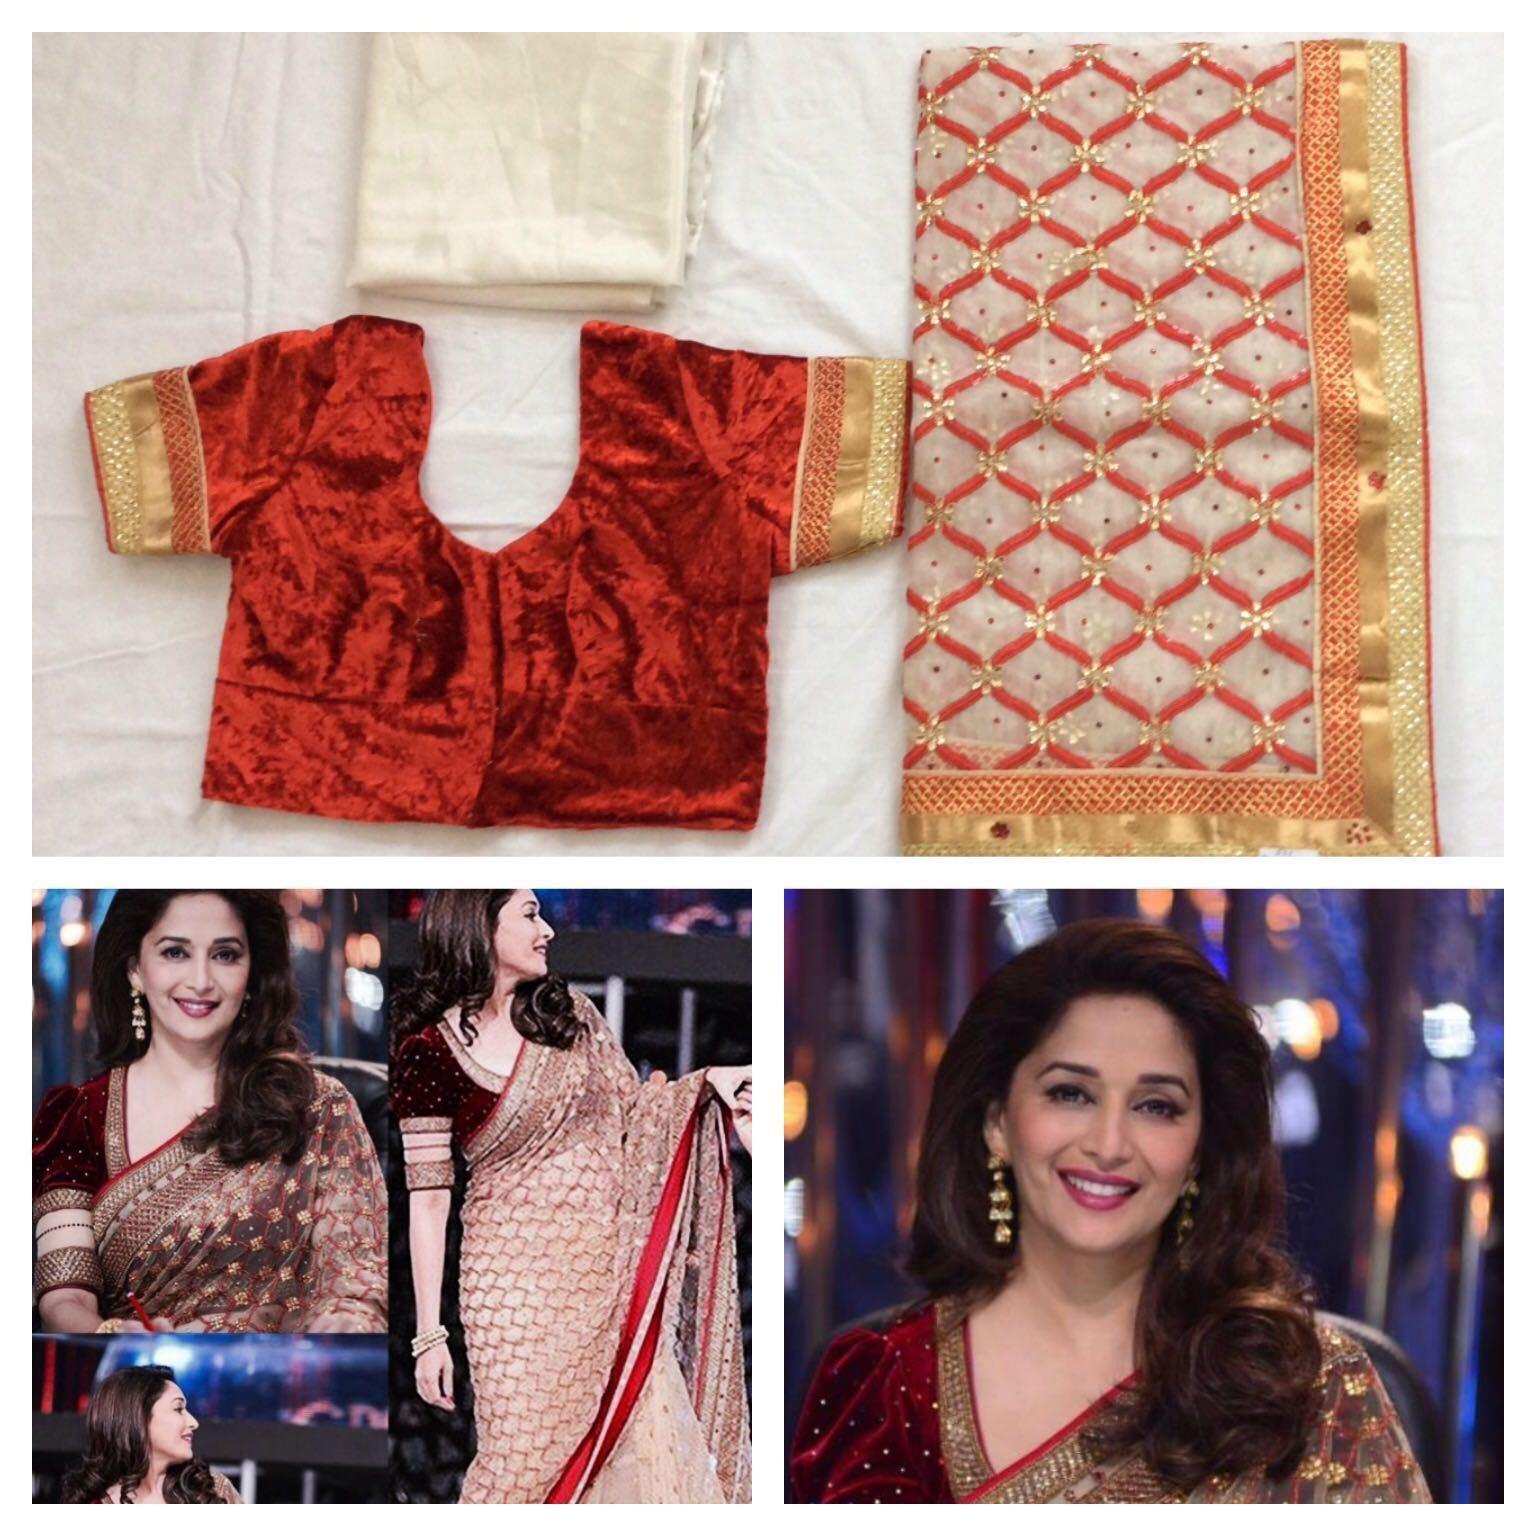 Donna Indiano Bollywood Abito Net Designer Sari Ready Made Matrimonio oro Bianco